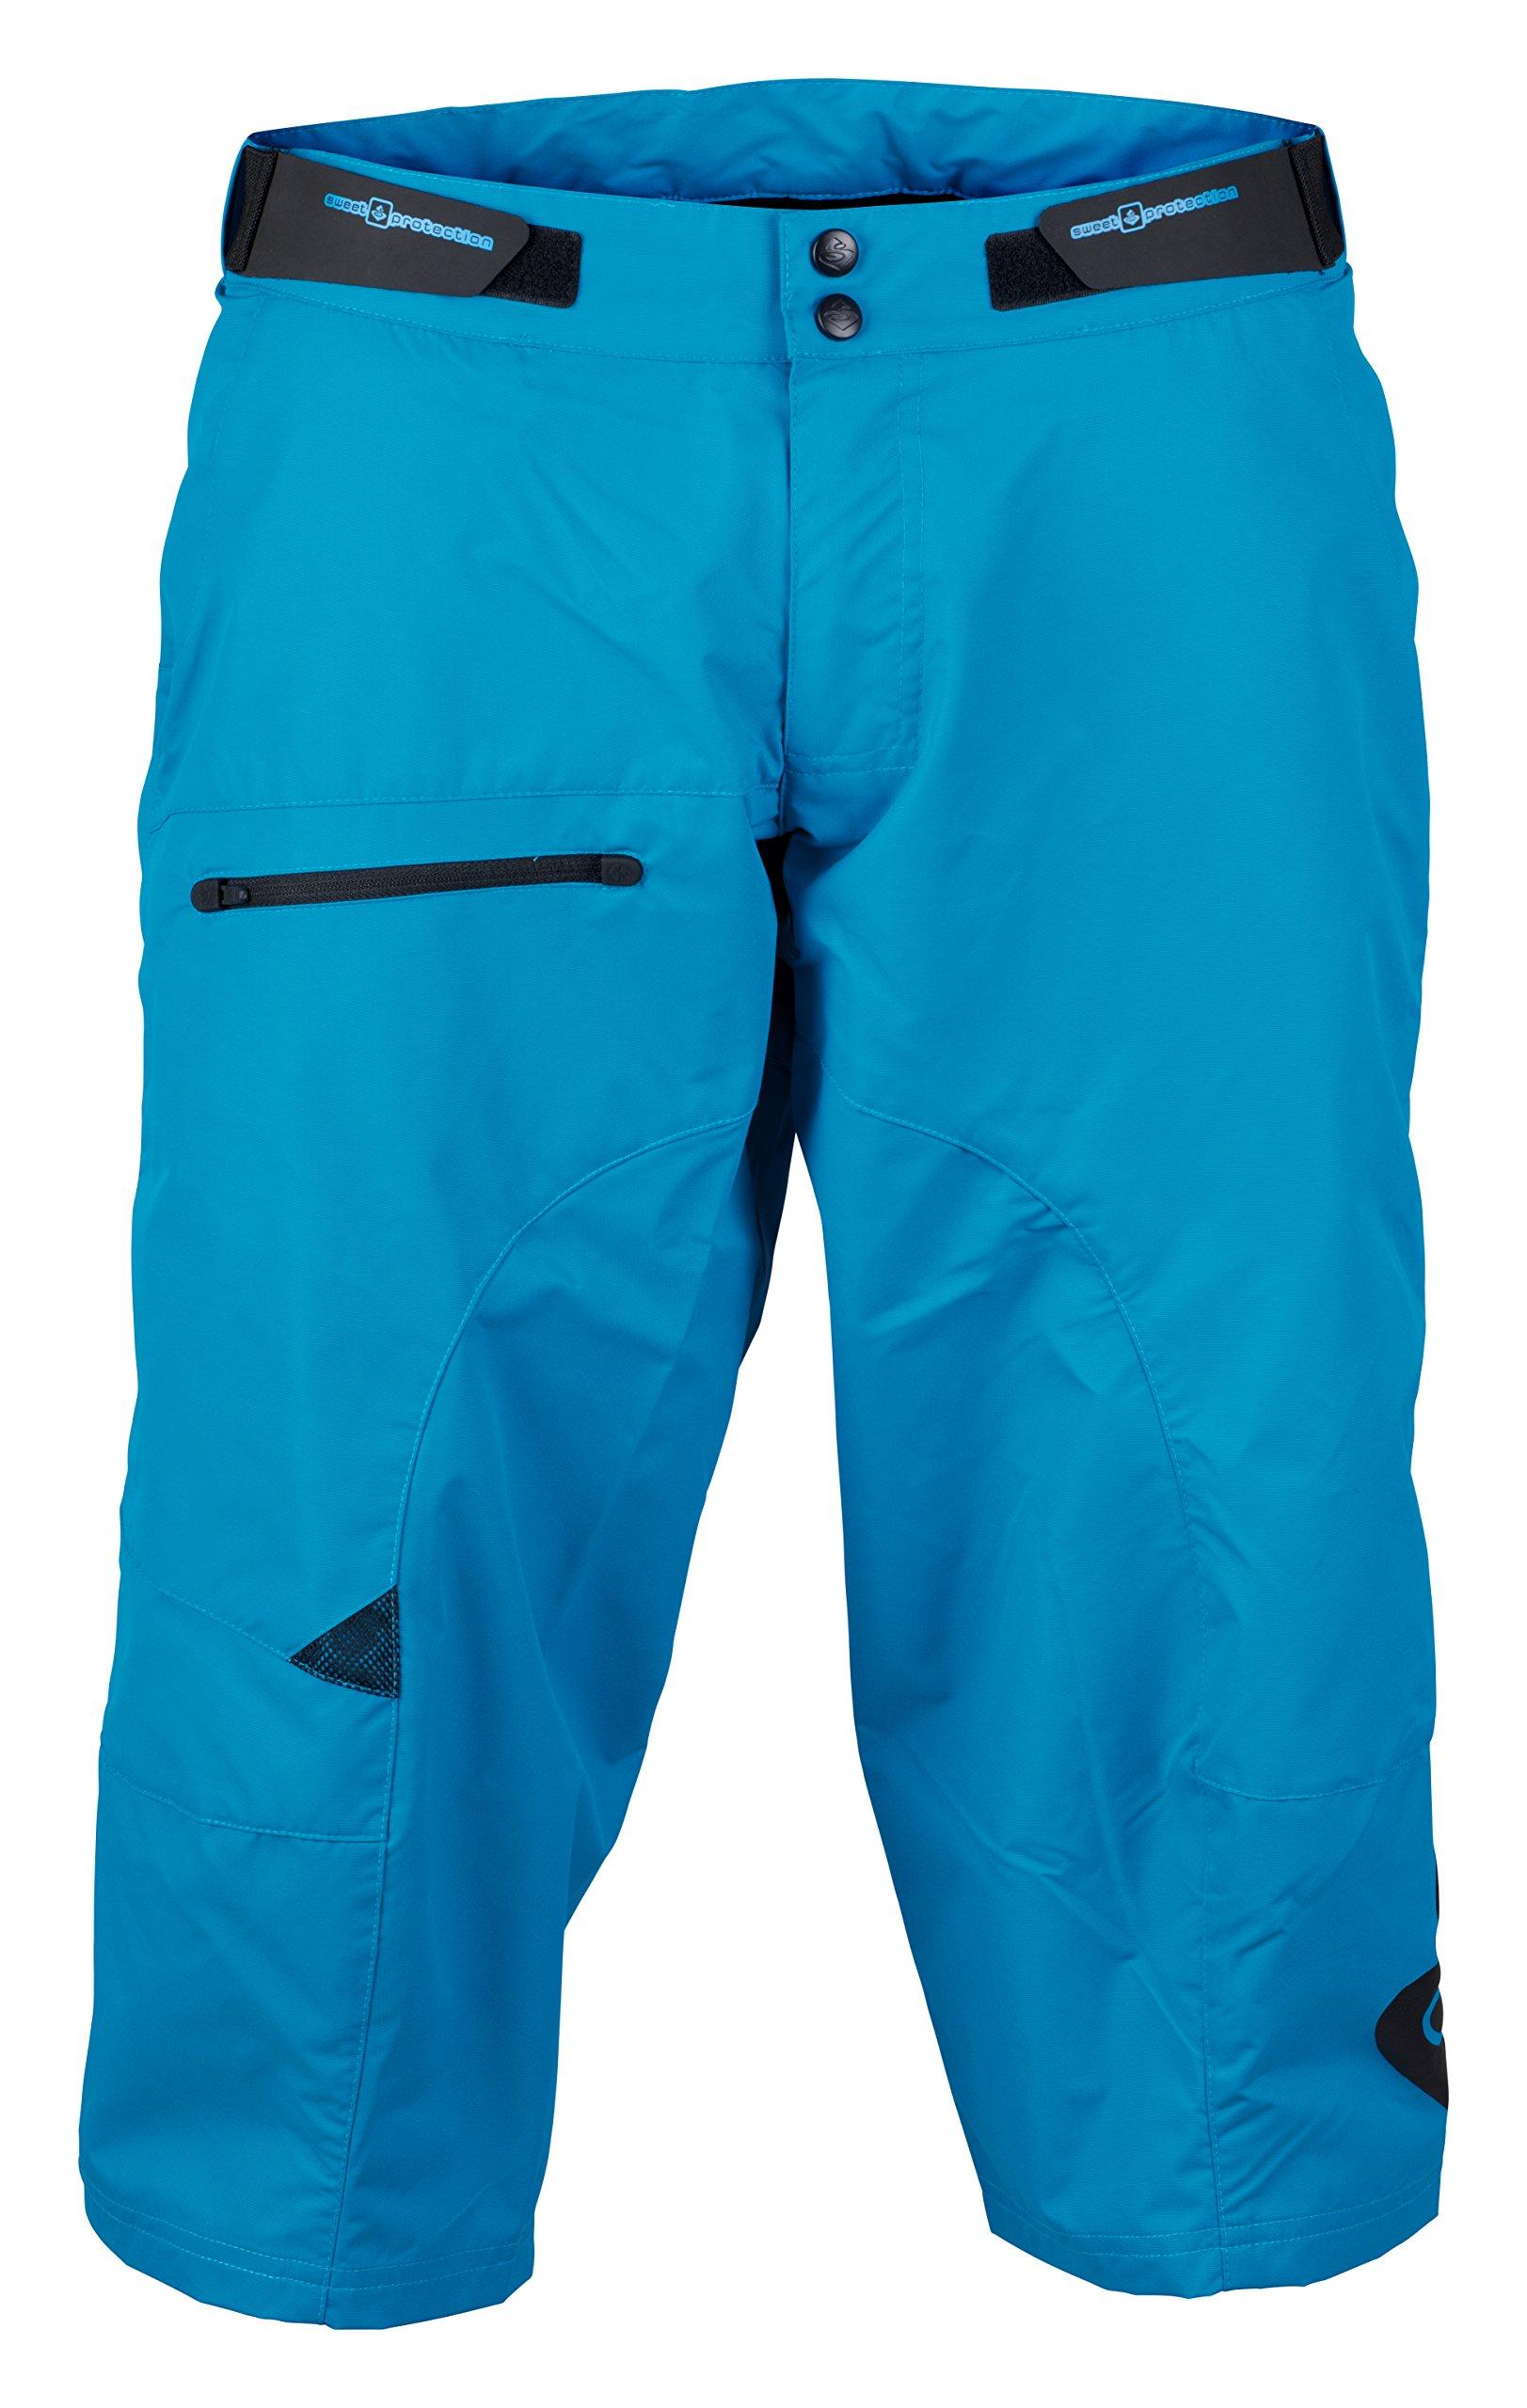 Sweet Protection Shambala Paddle Short - Men's Bird Blue, XL by Sweet Protection